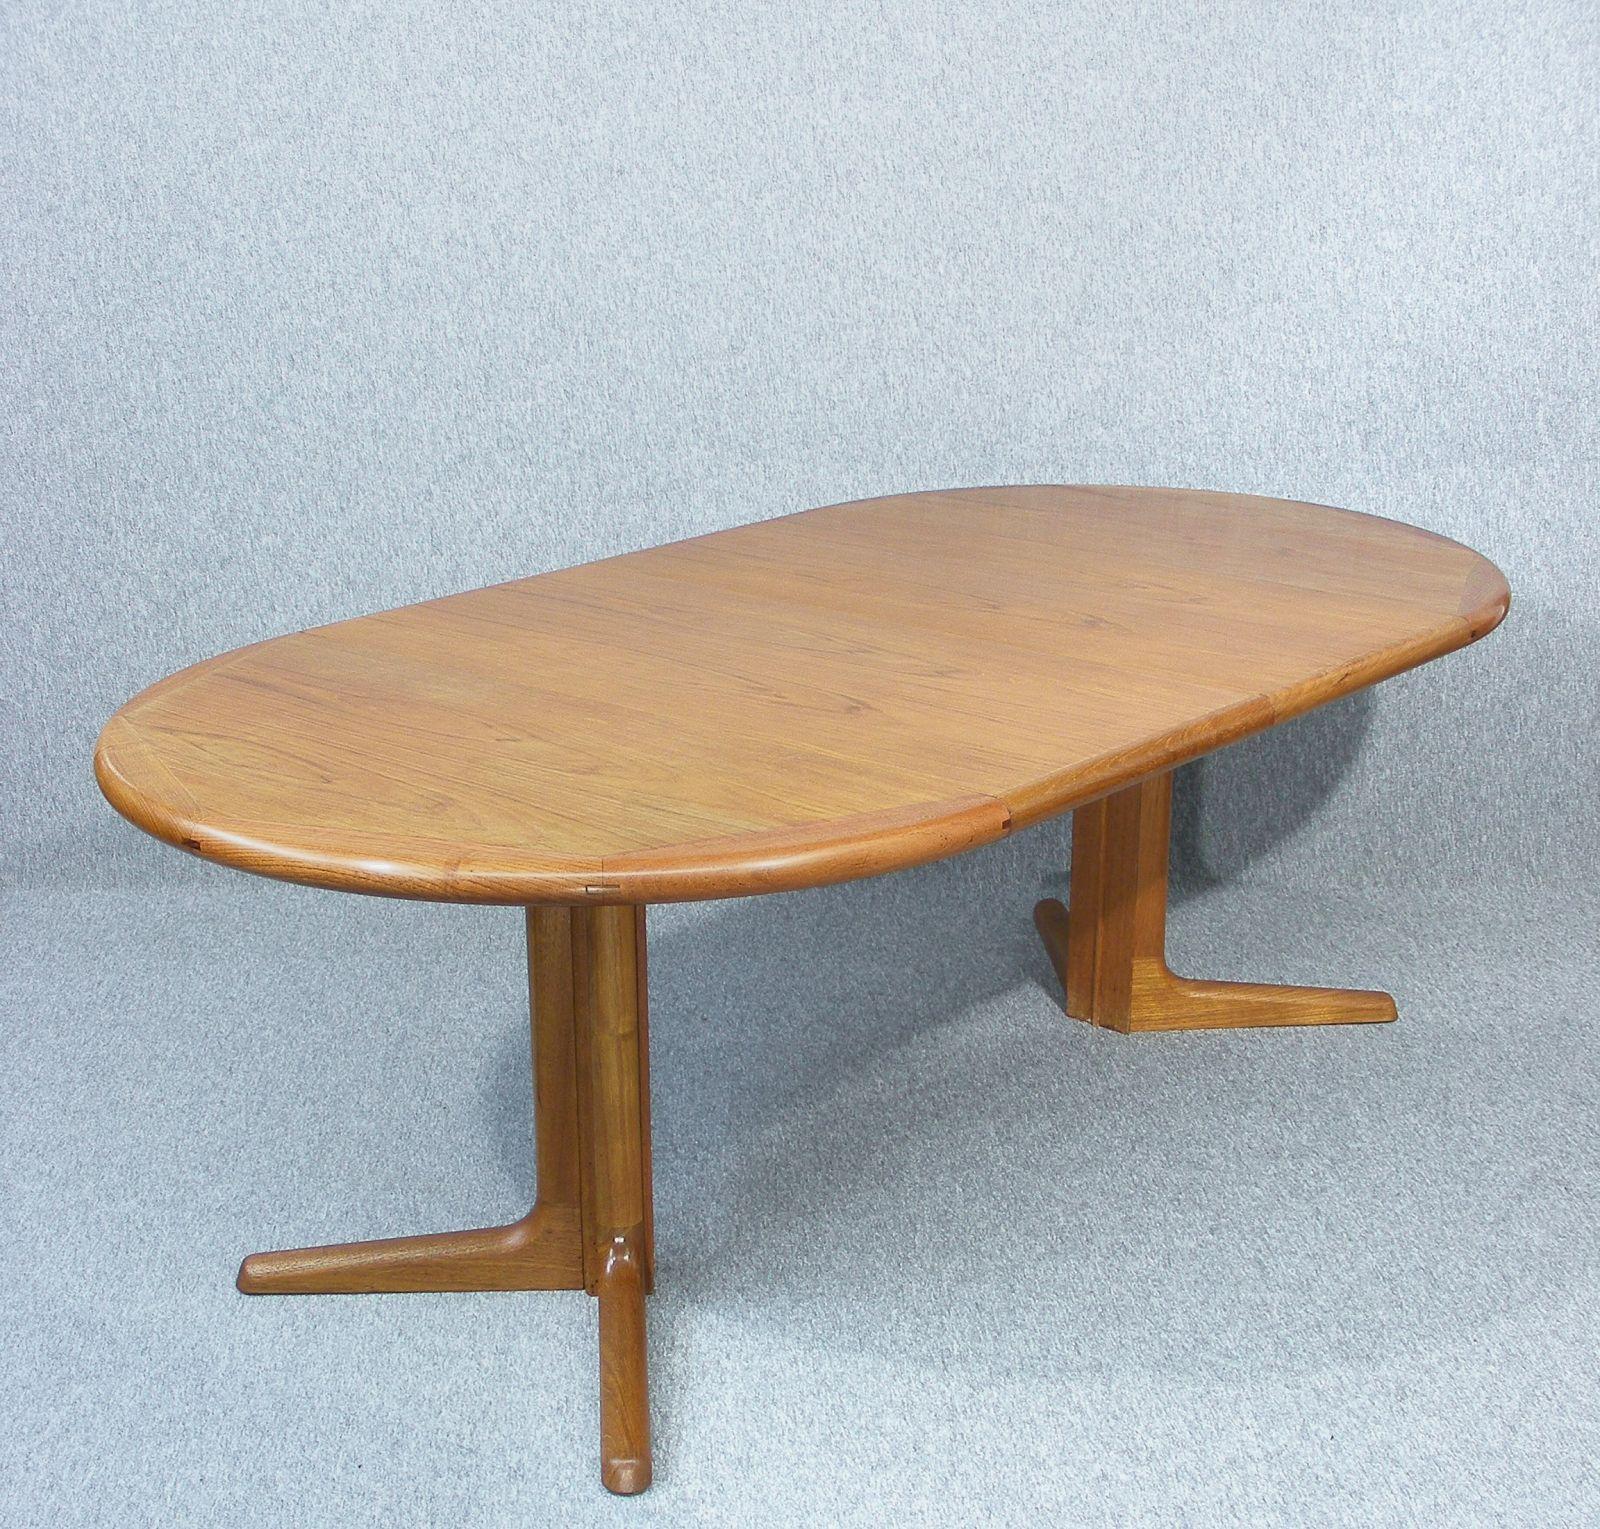 Fully restored mid century Danish Dyrlund teak dining table